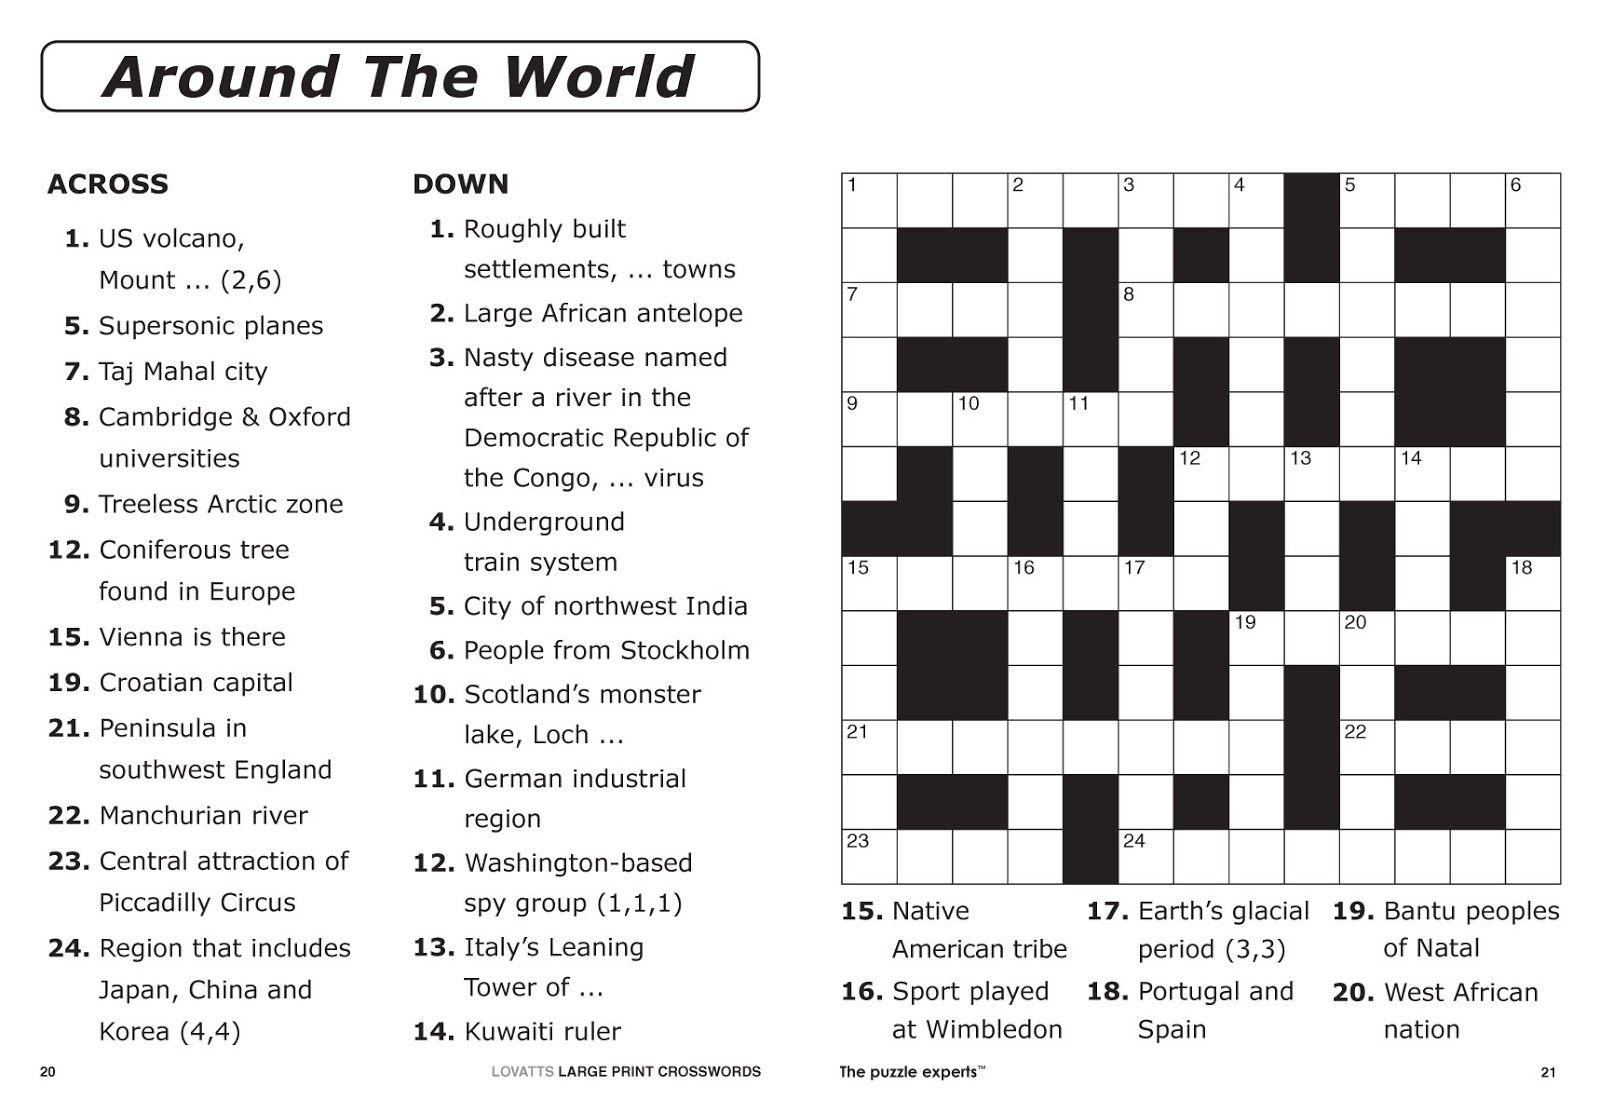 Free Printable Large Print Crossword Puzzles   M3U8 - Free Printable - Easy Large Print Crossword Puzzles Printable